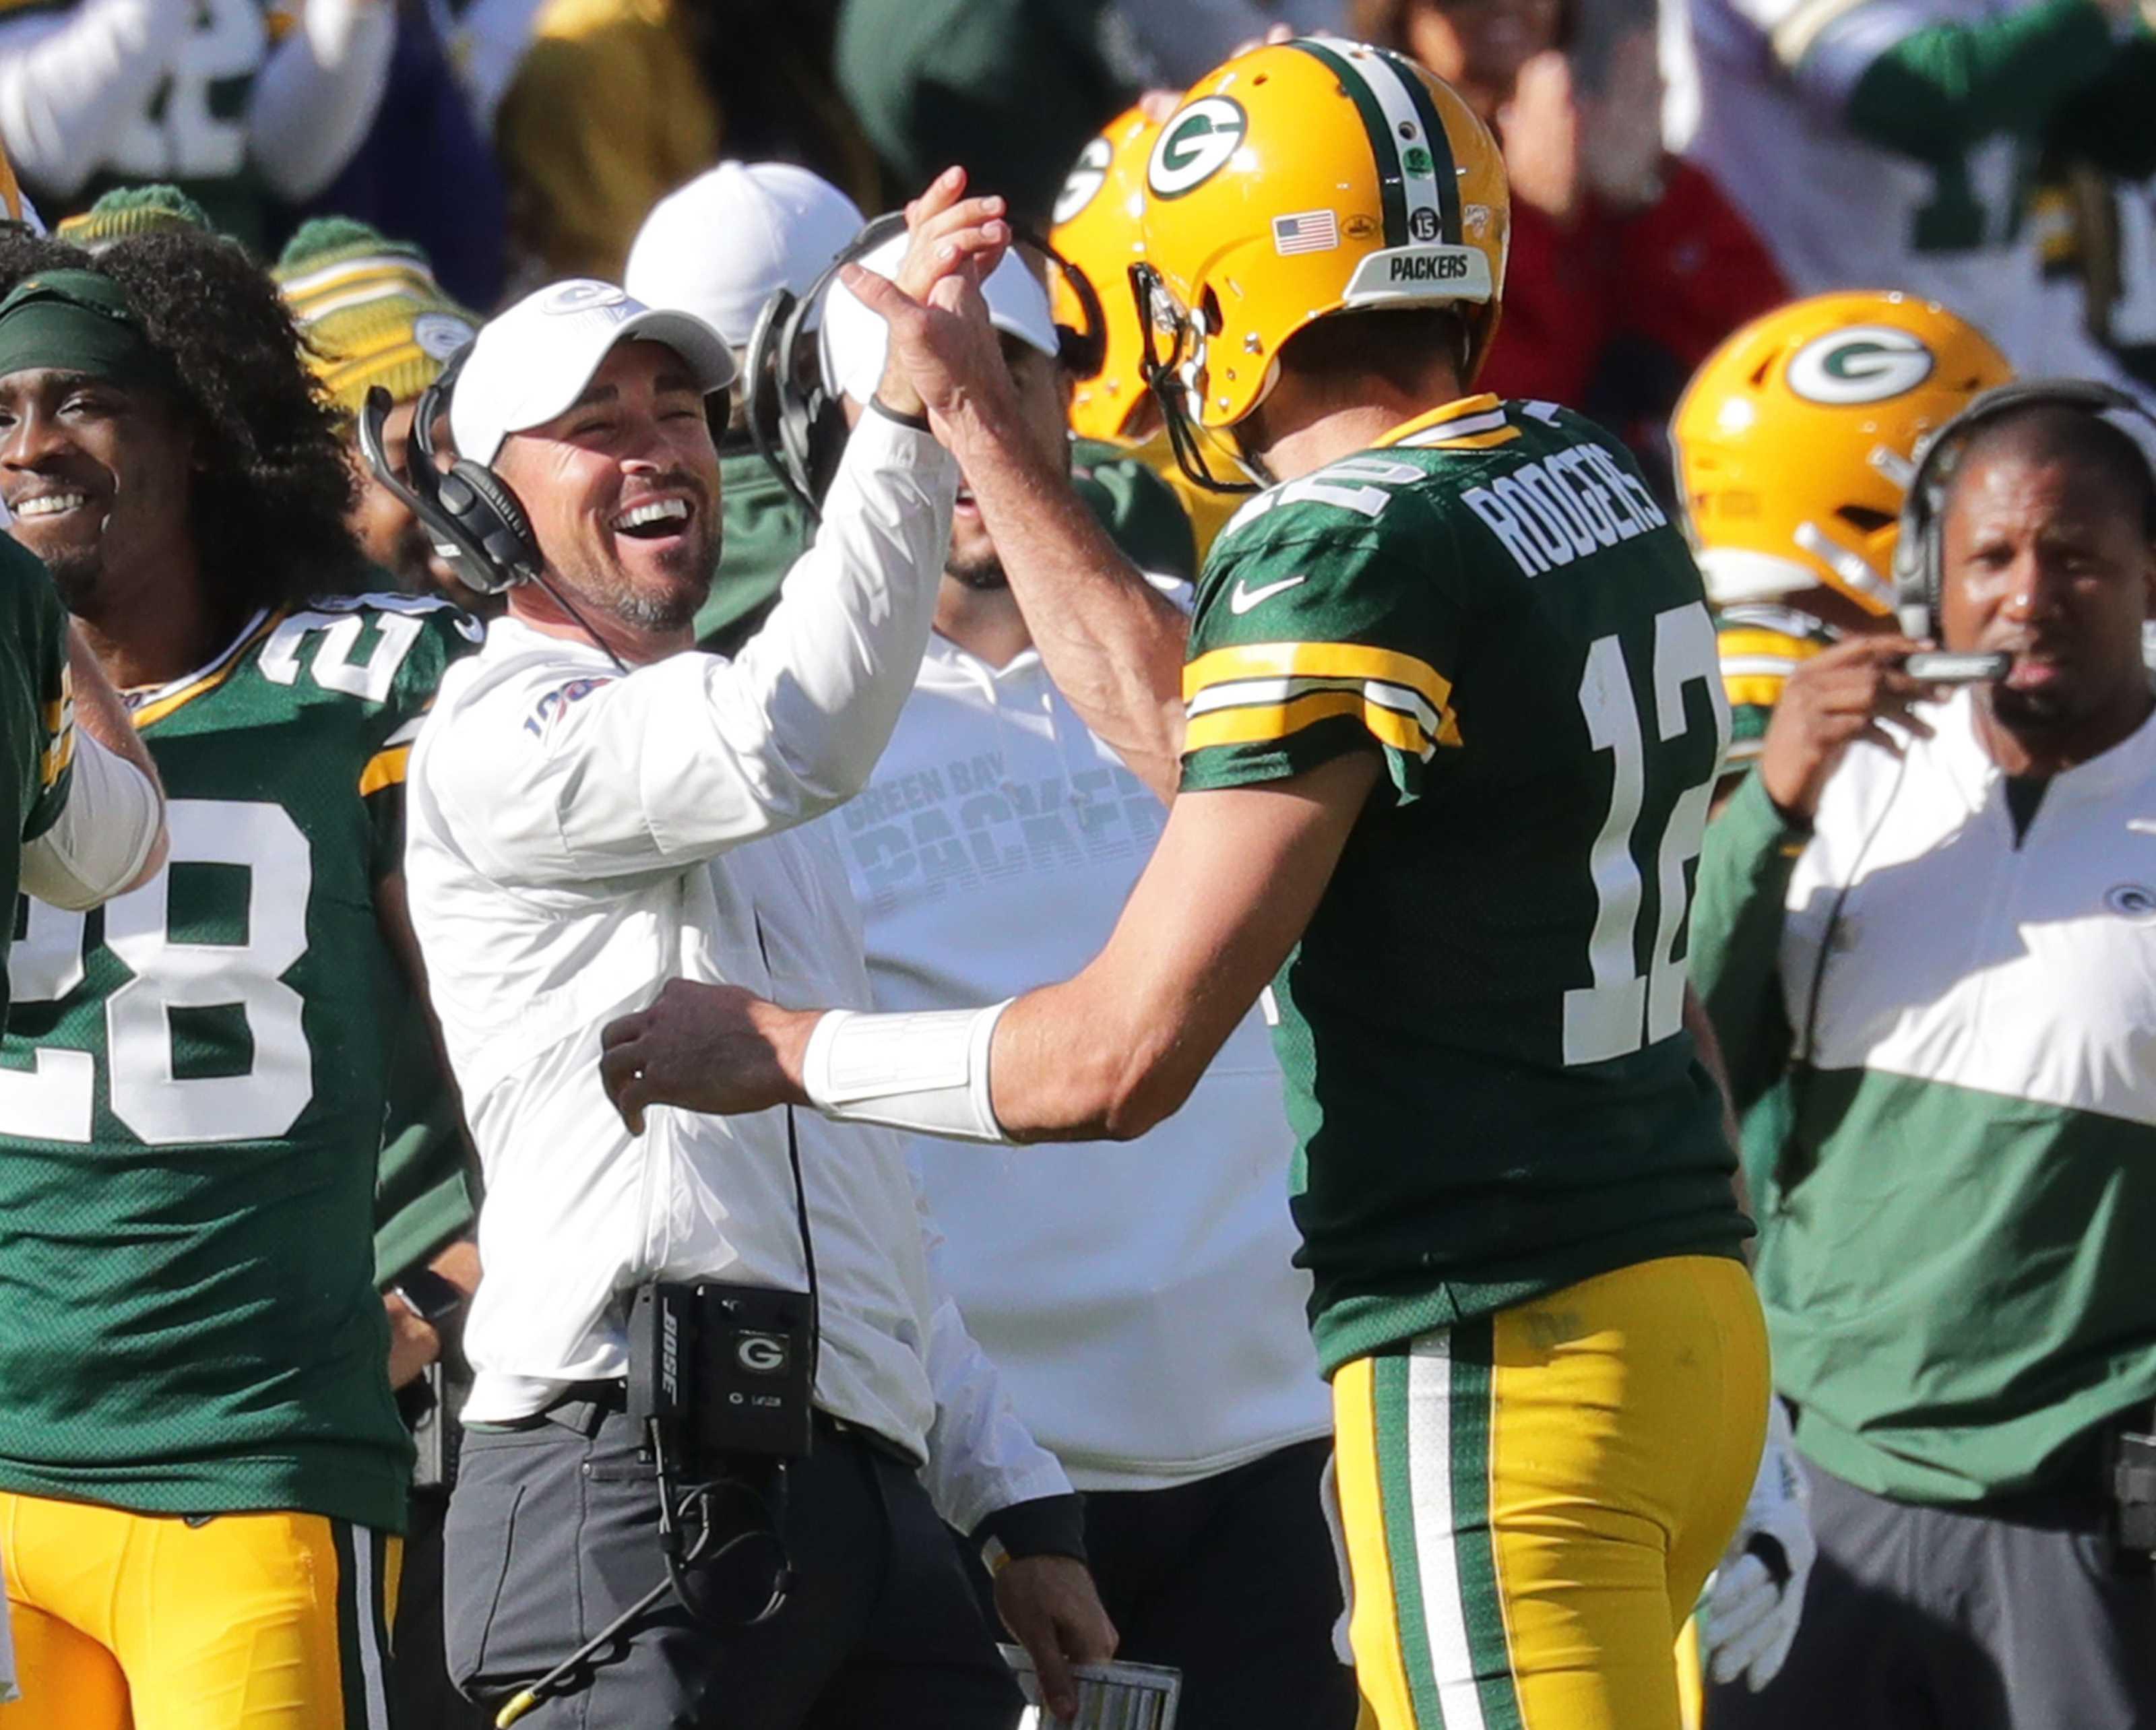 Green Bay Packers Offense Shines in Red Zone Under Matt LaFleur